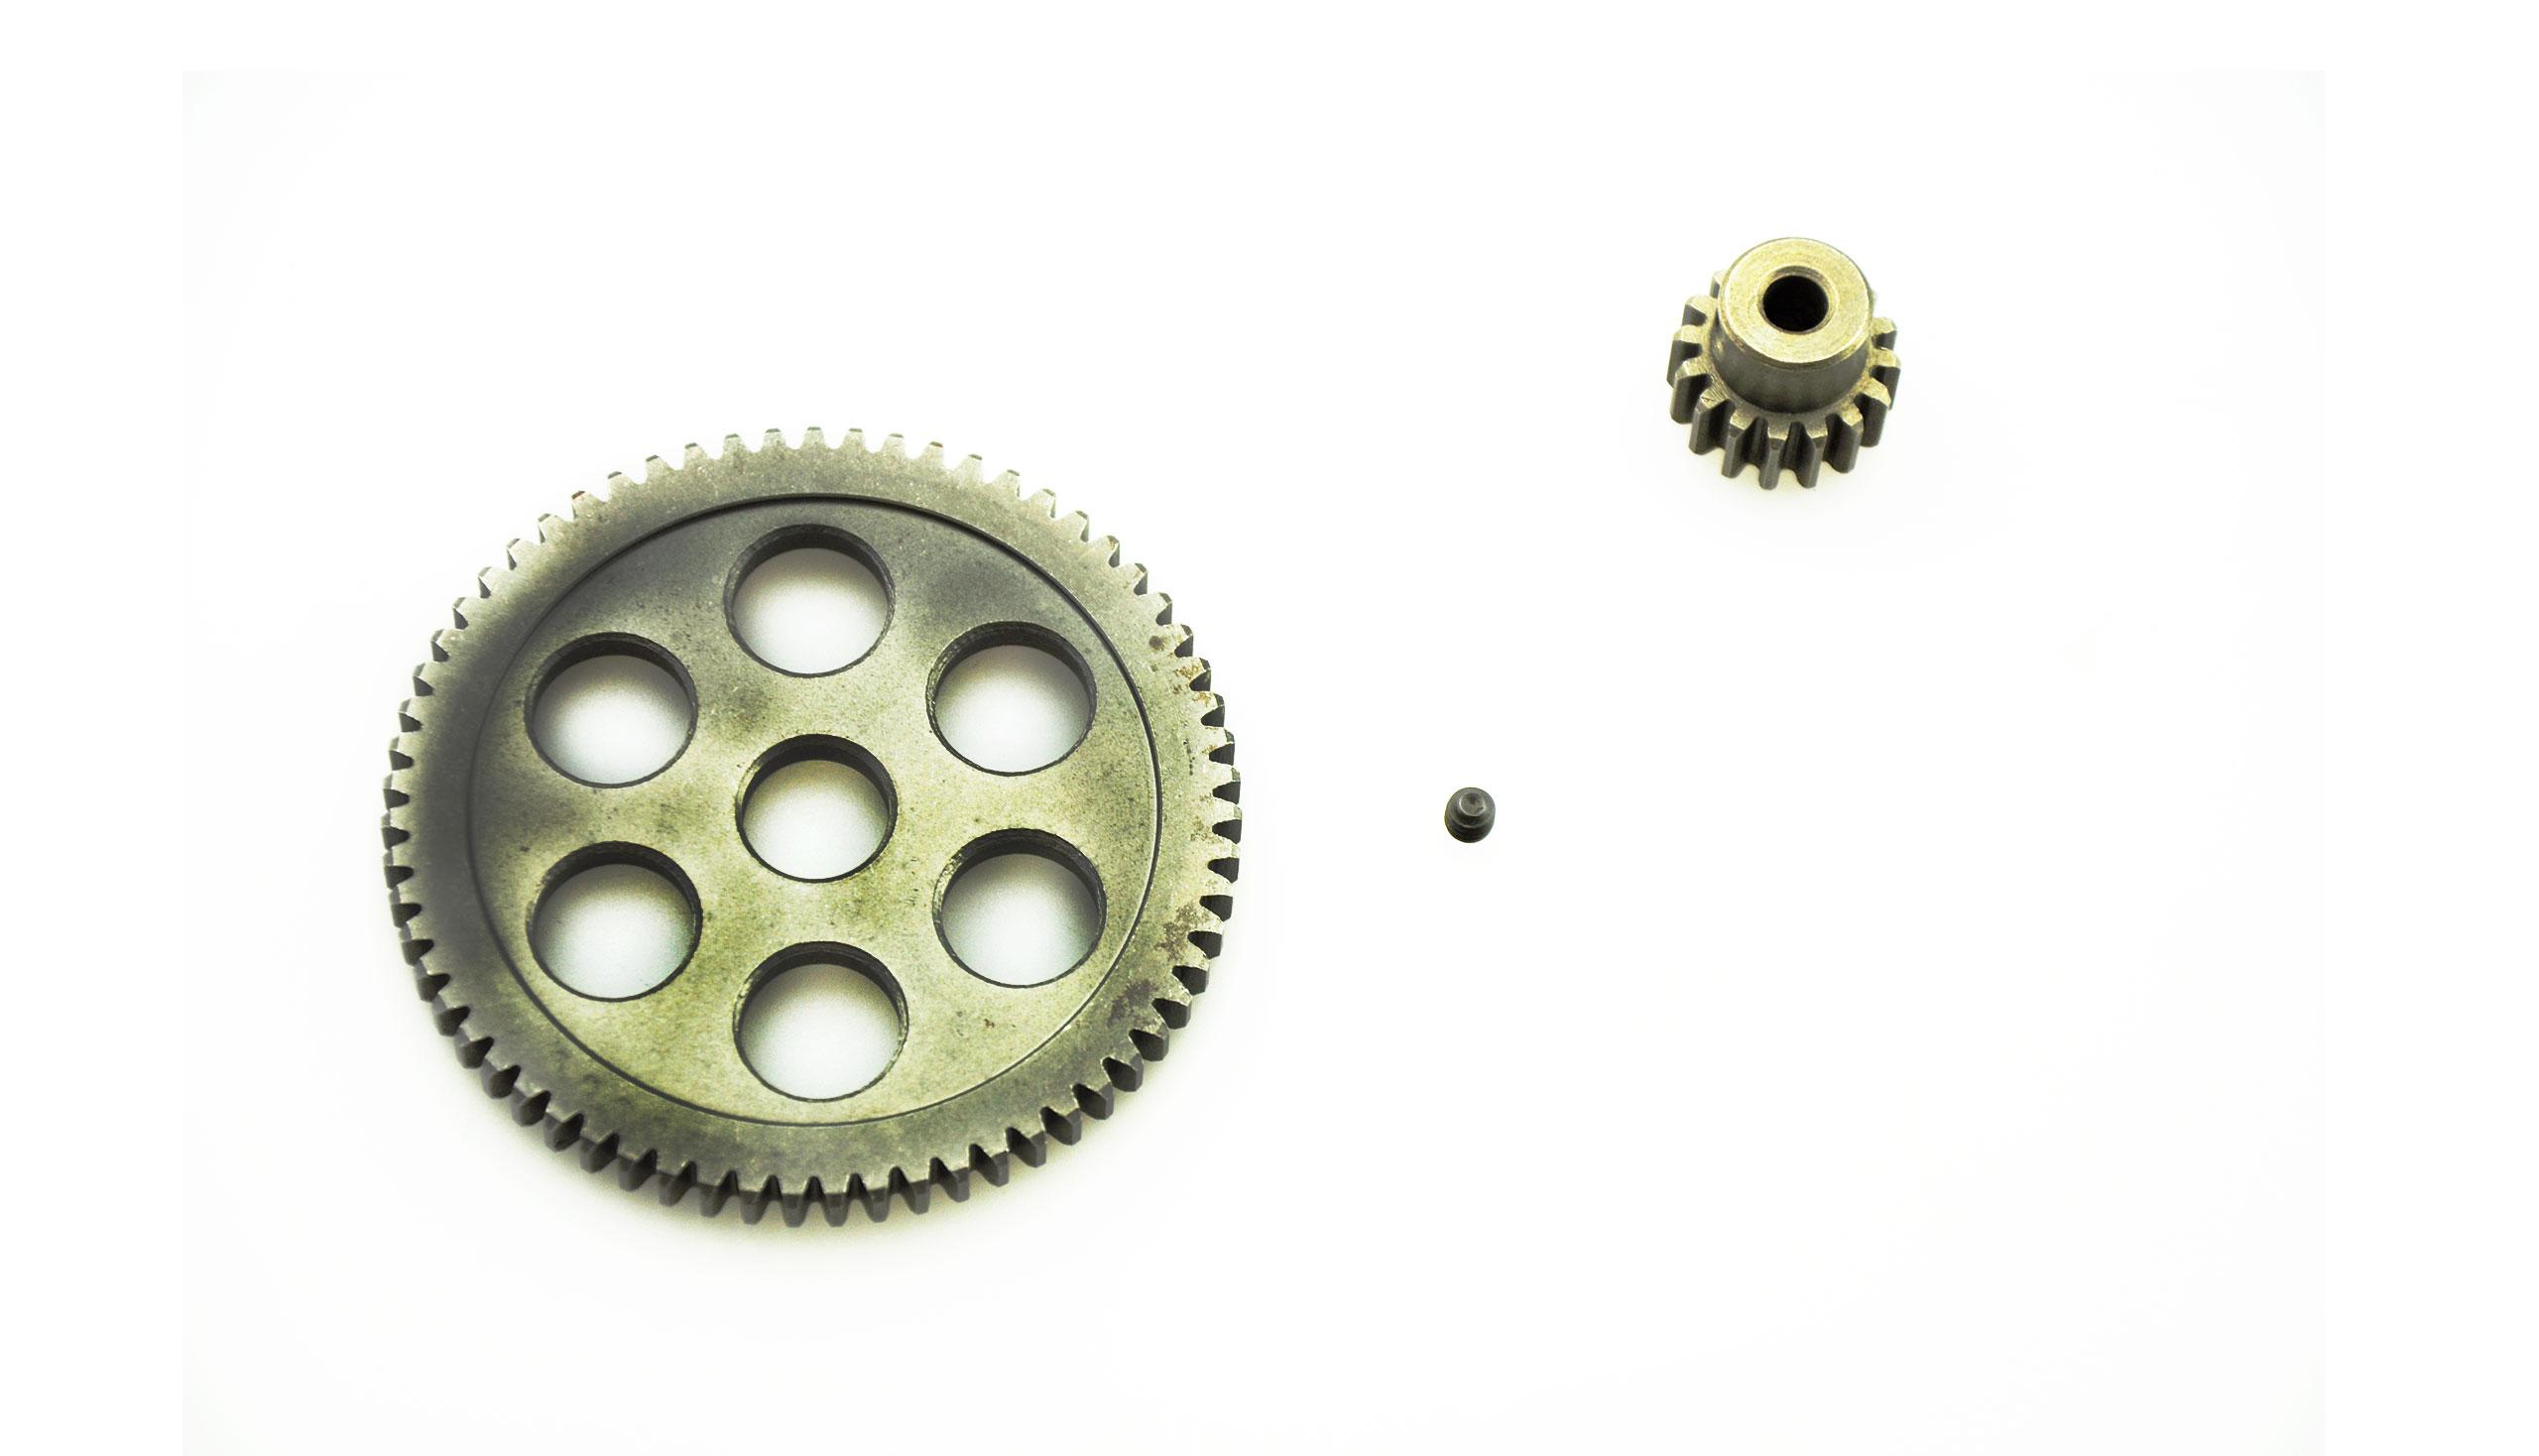 Hauptzahnrad & Motorritzel Stahl 63 Zaehne/16 Zaehne